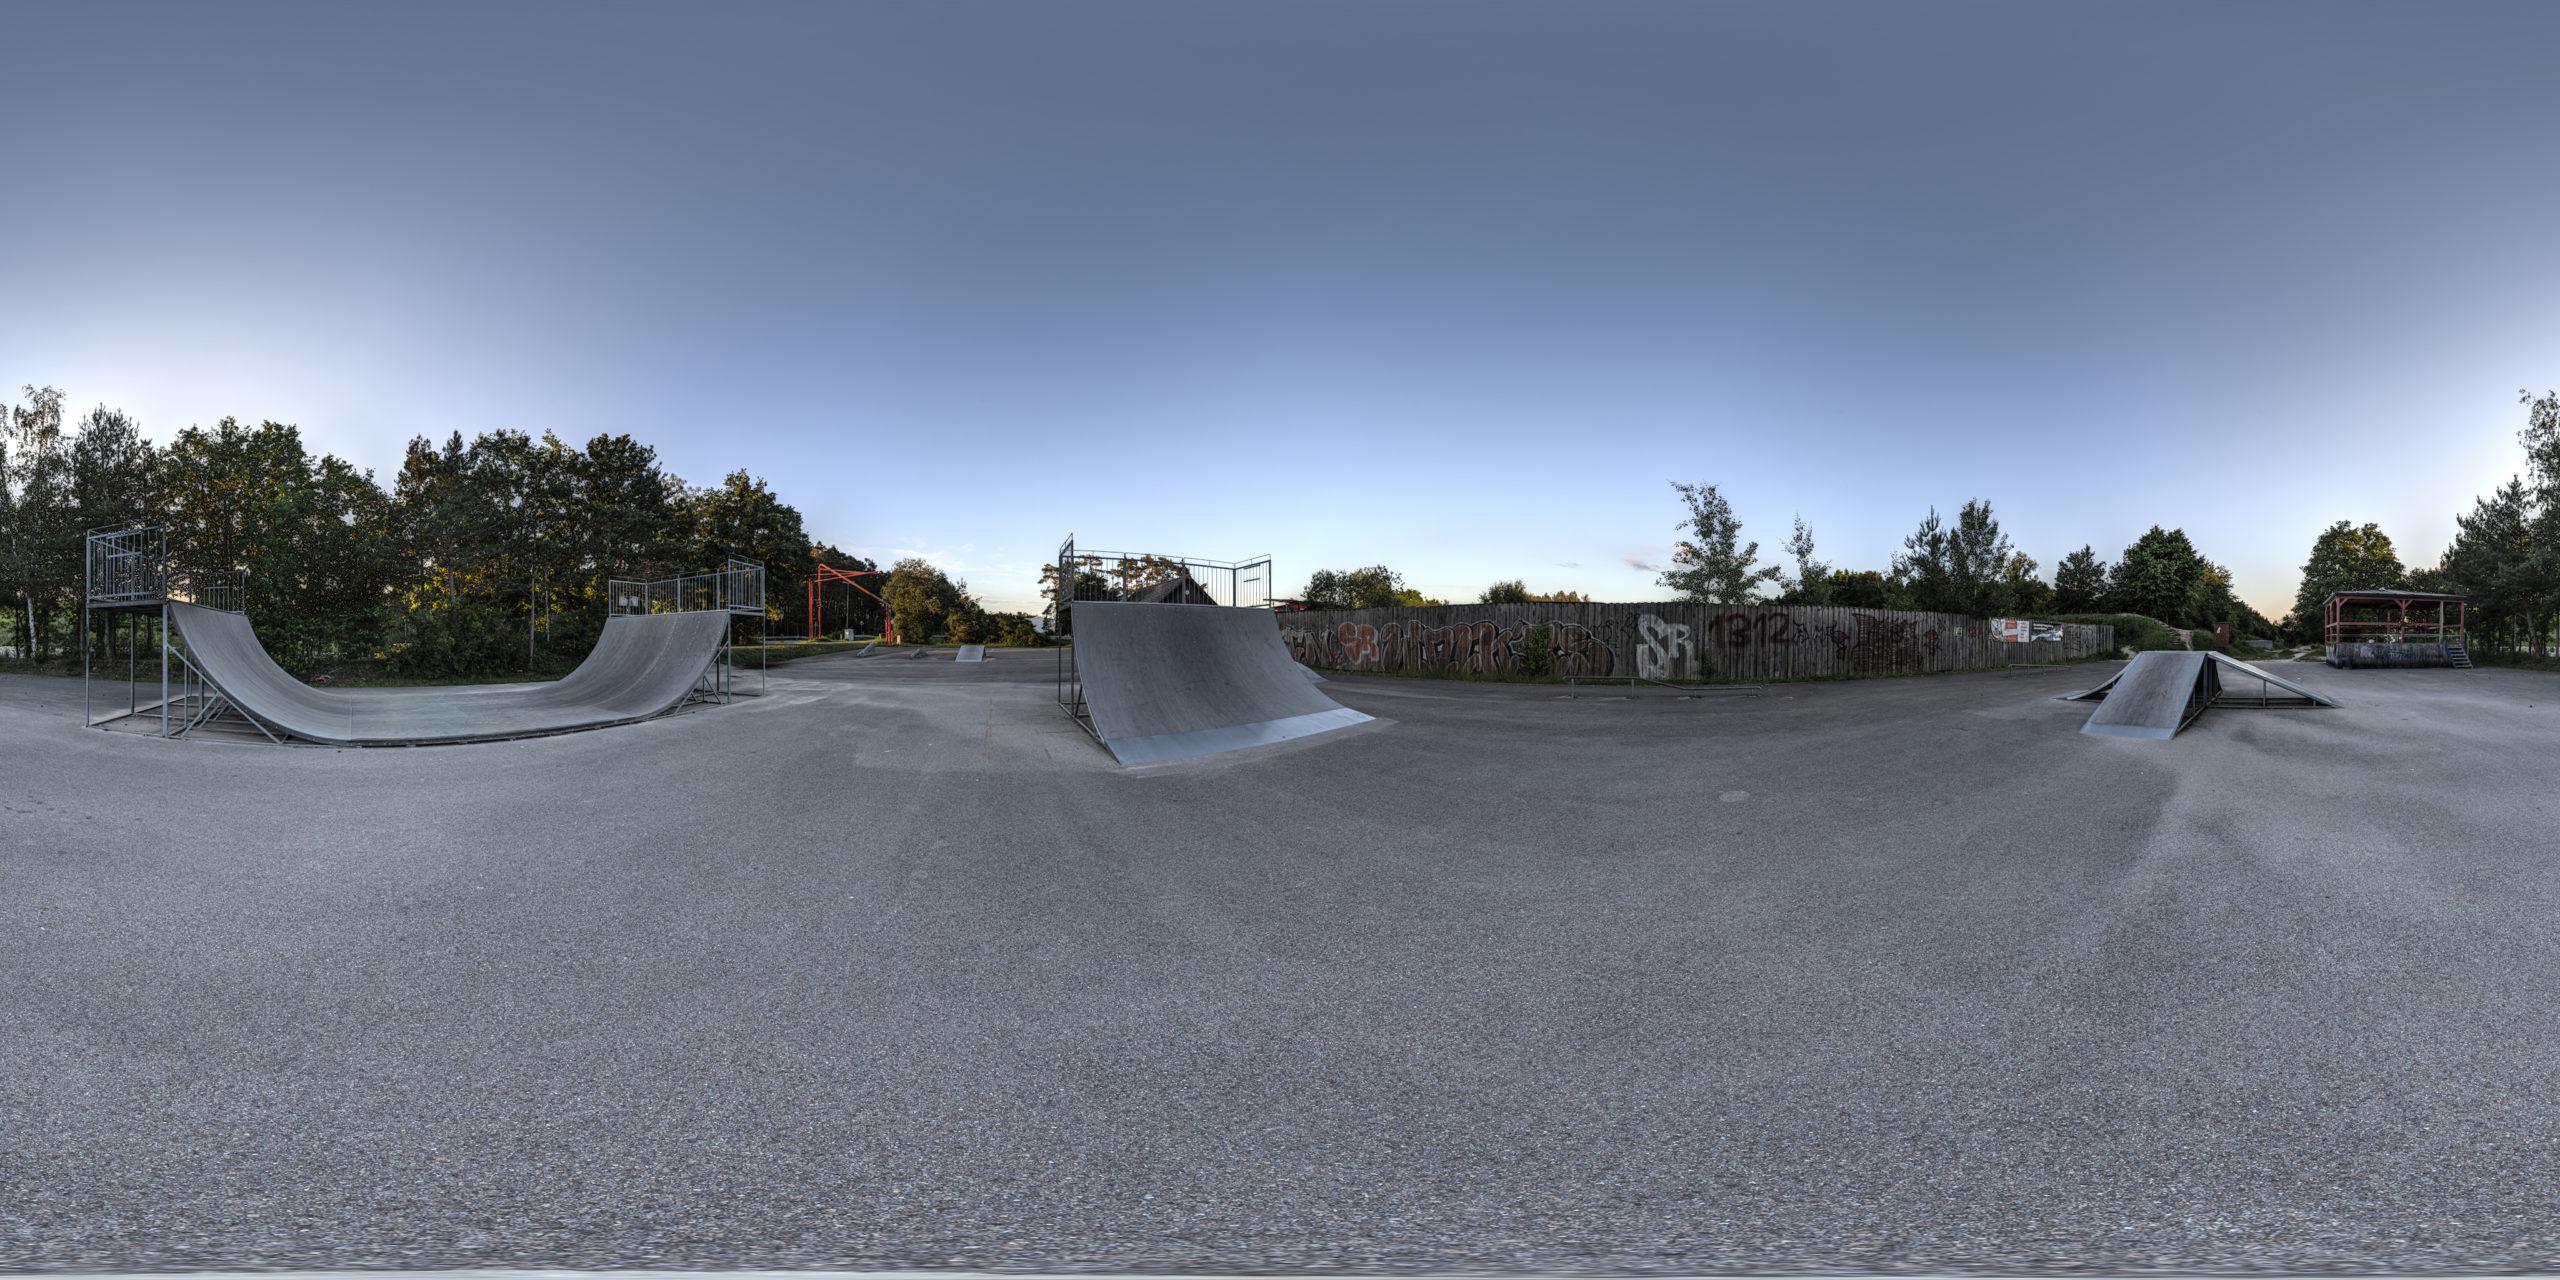 HDRI-Skies-Skate-Park-Georgensgmünd